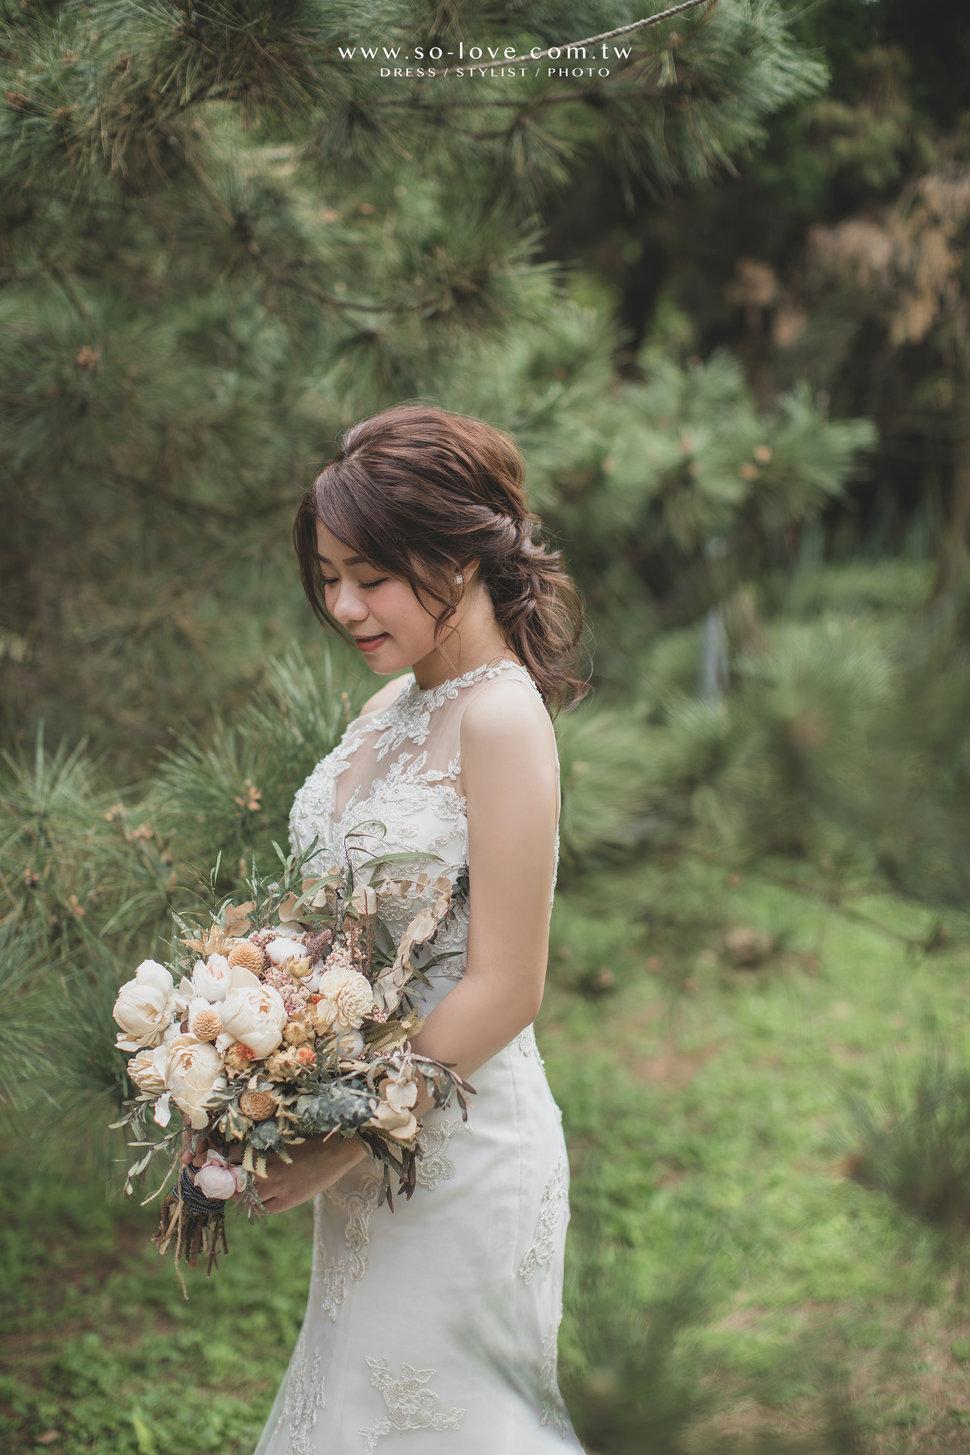 RYAN8069 - So.Love Wedding 樂樂蕾絲《結婚吧》